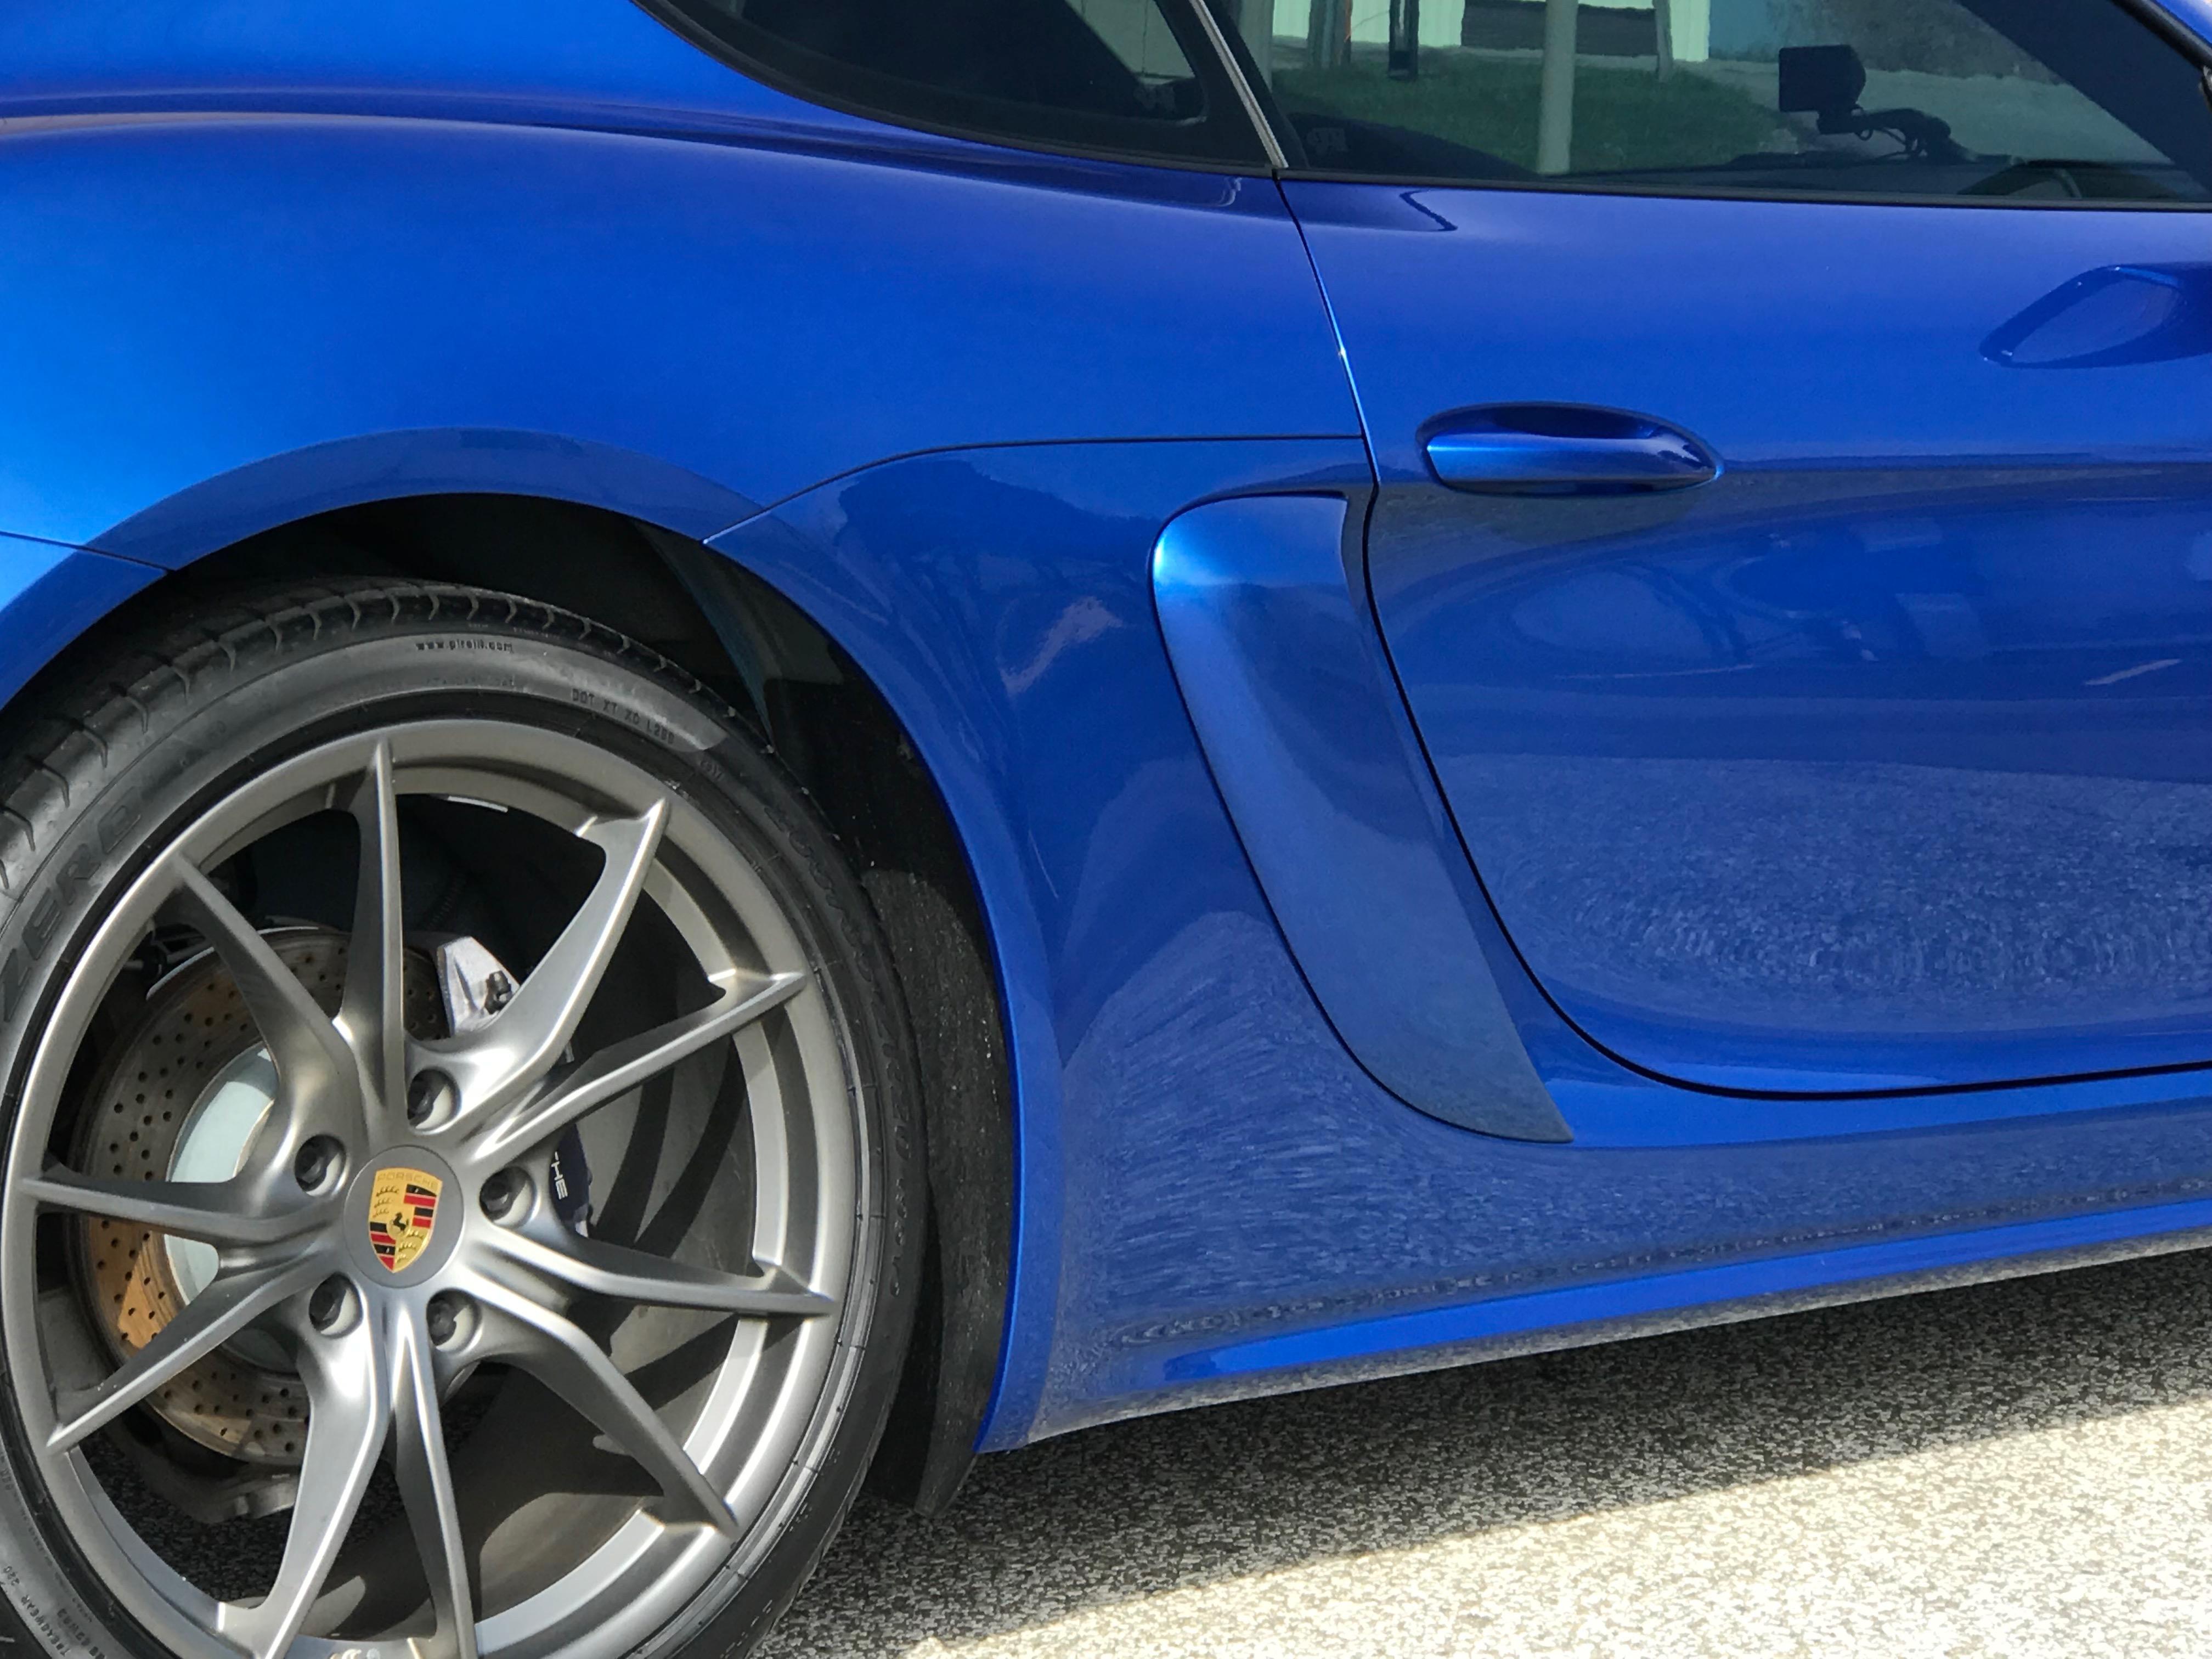 JC SPORTLINE Fits for Porsche 981 Boxster Carbon Fiber Air Intake Side Scoop Cover Fender Vents Trims 2013-2015 2pcs//Set